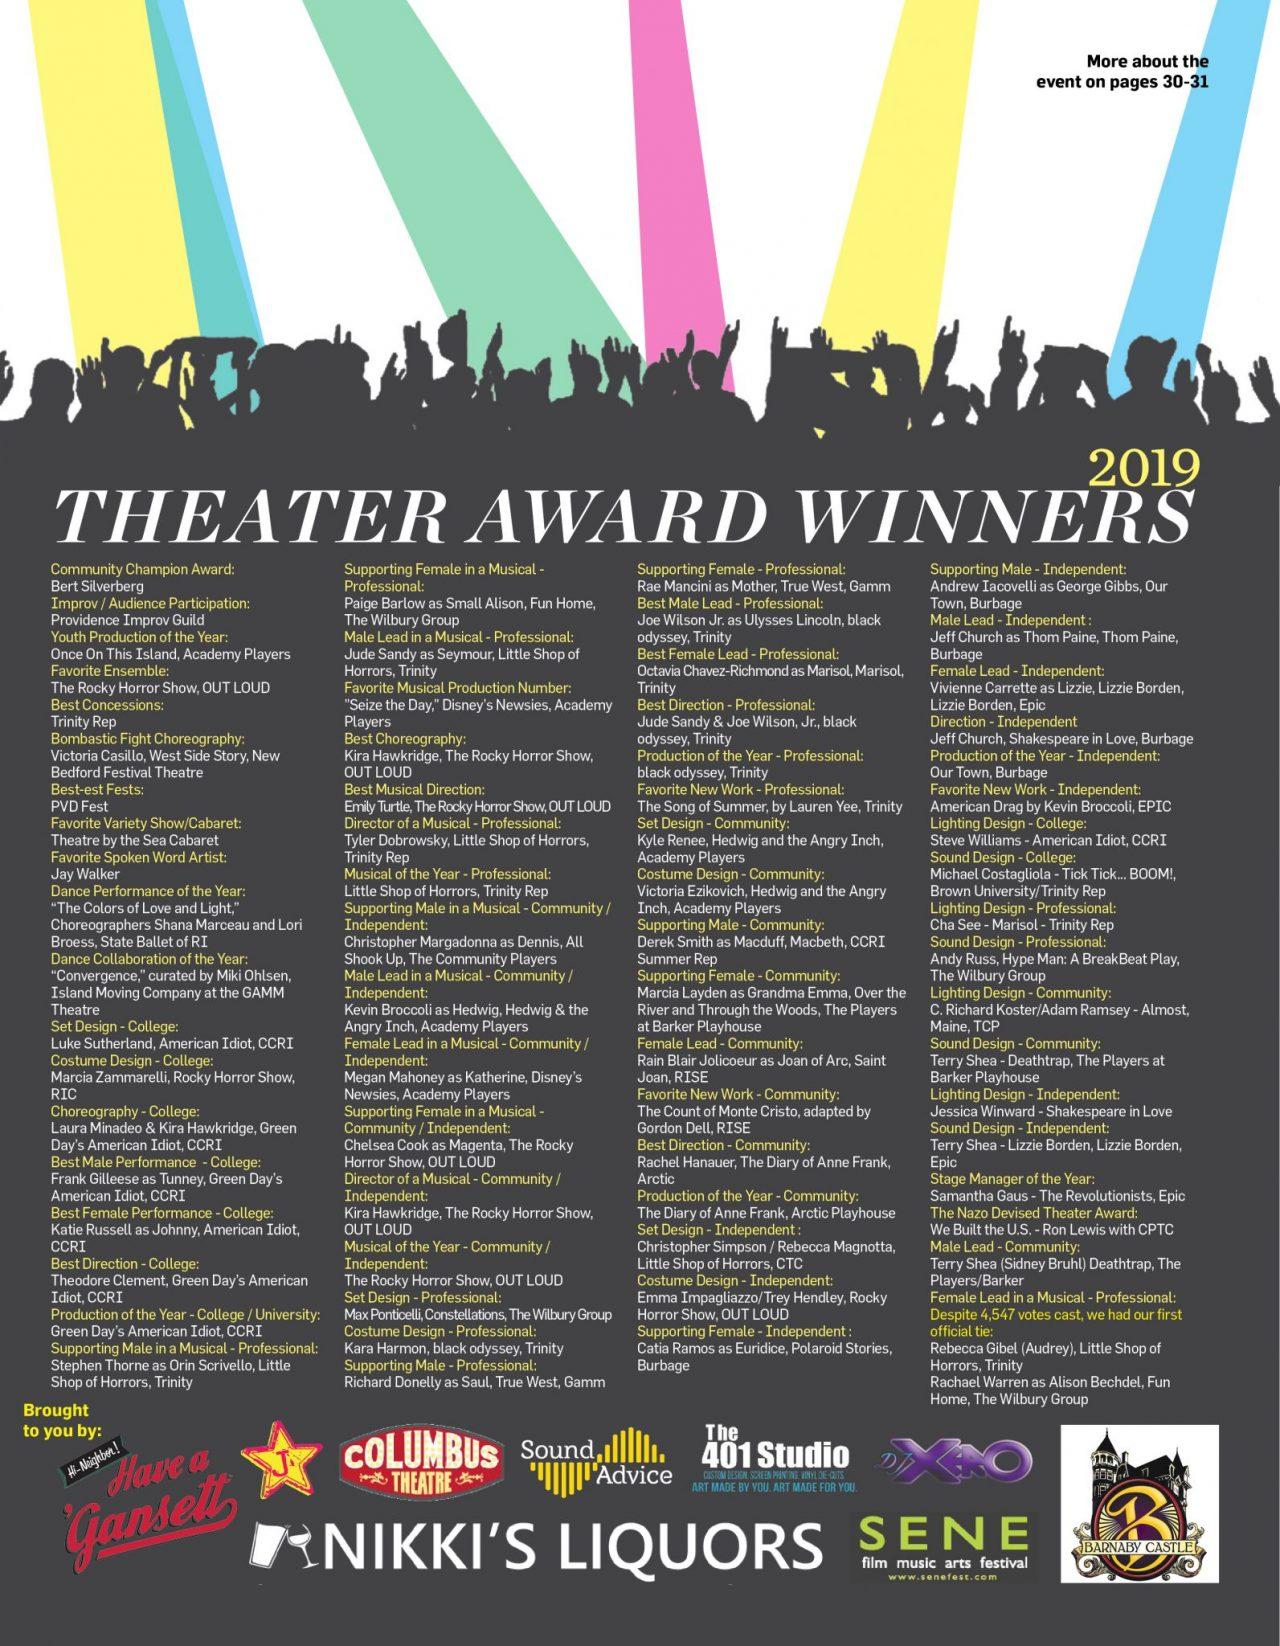 2019 Theater Award Winners › Providence, Rhode Island